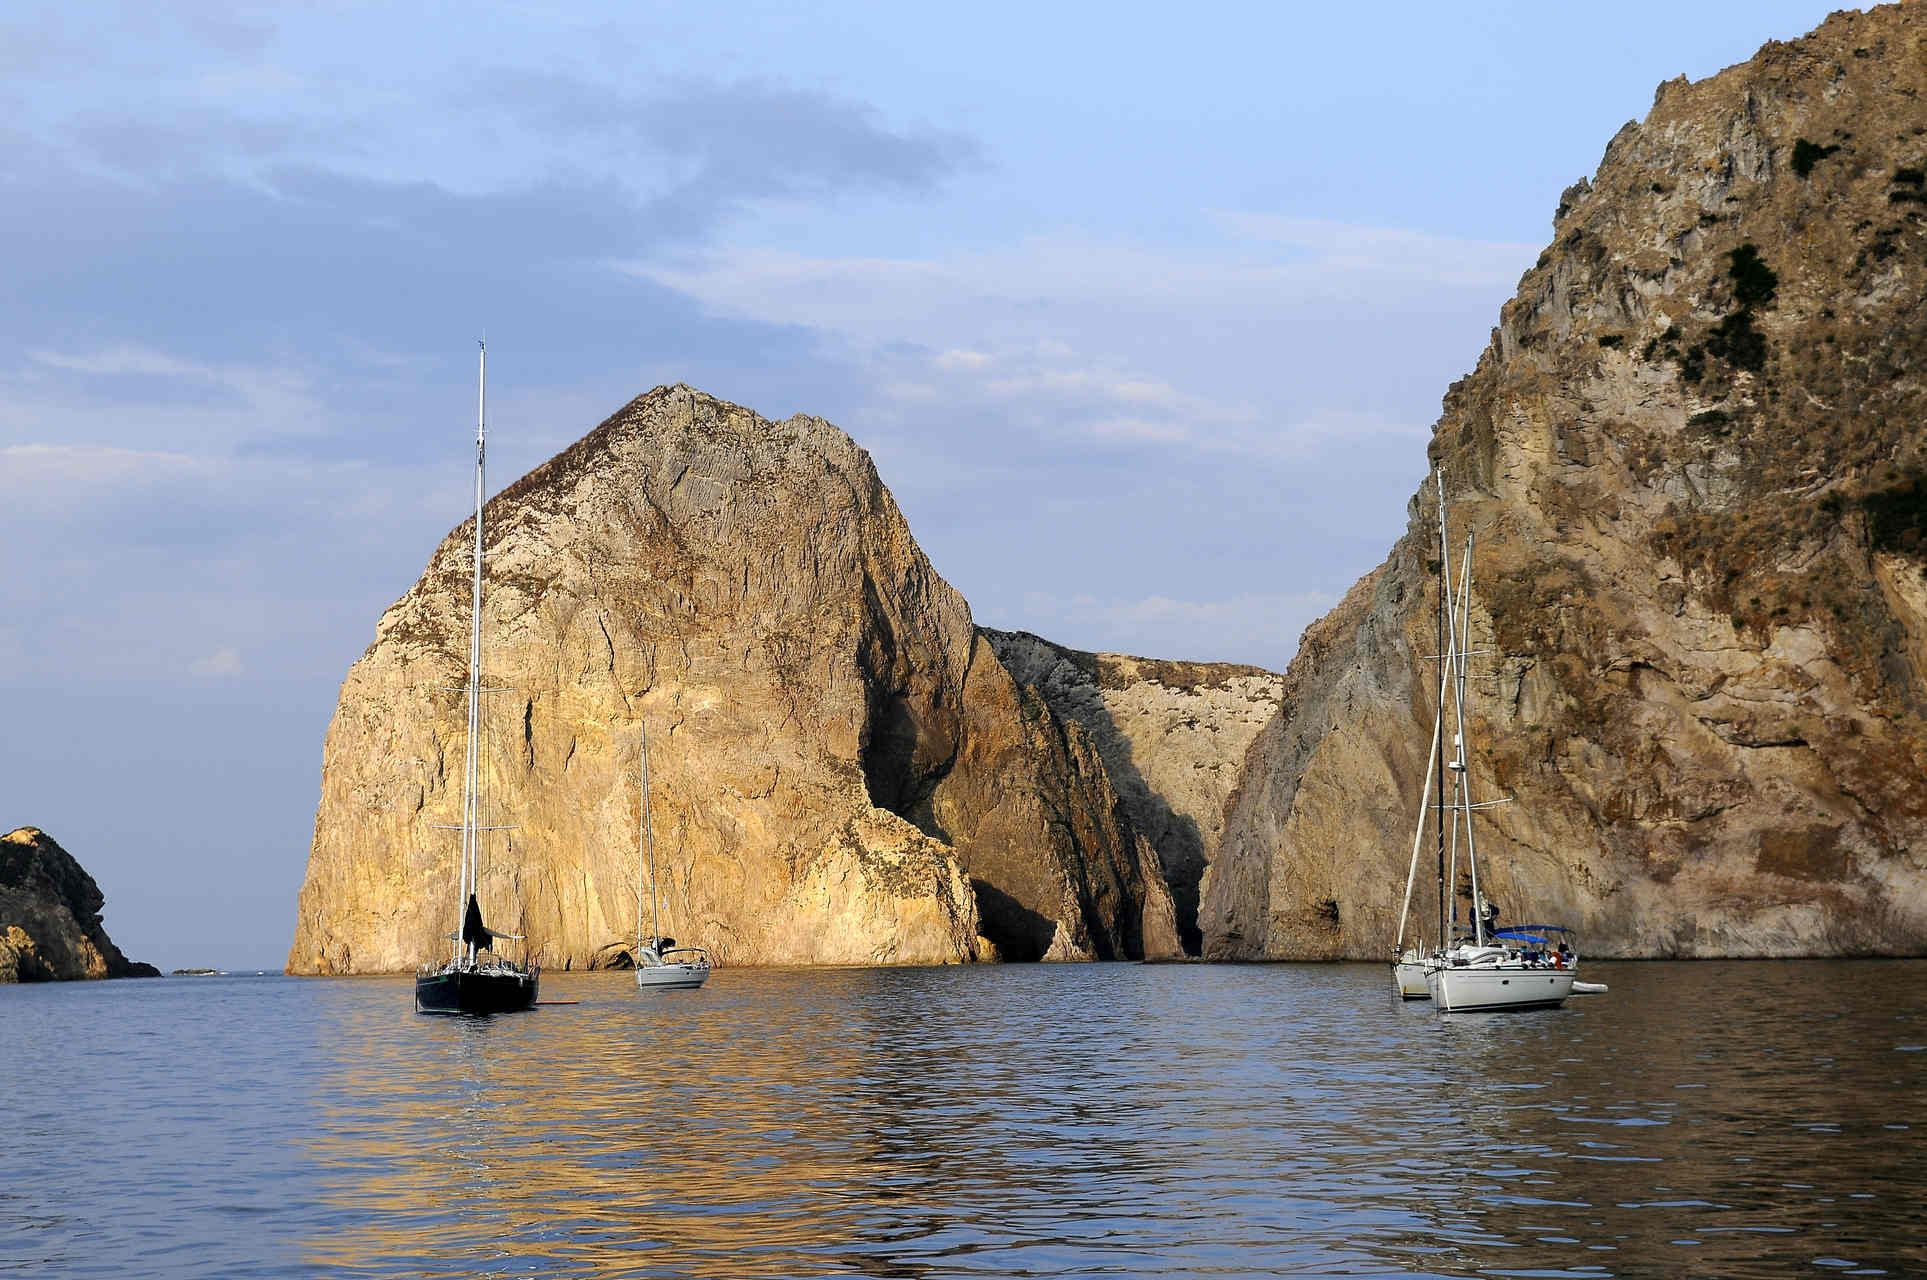 Vacanze e weekend in barca a vela Isole Pontine, Ponza, Palmarola e Ventotene